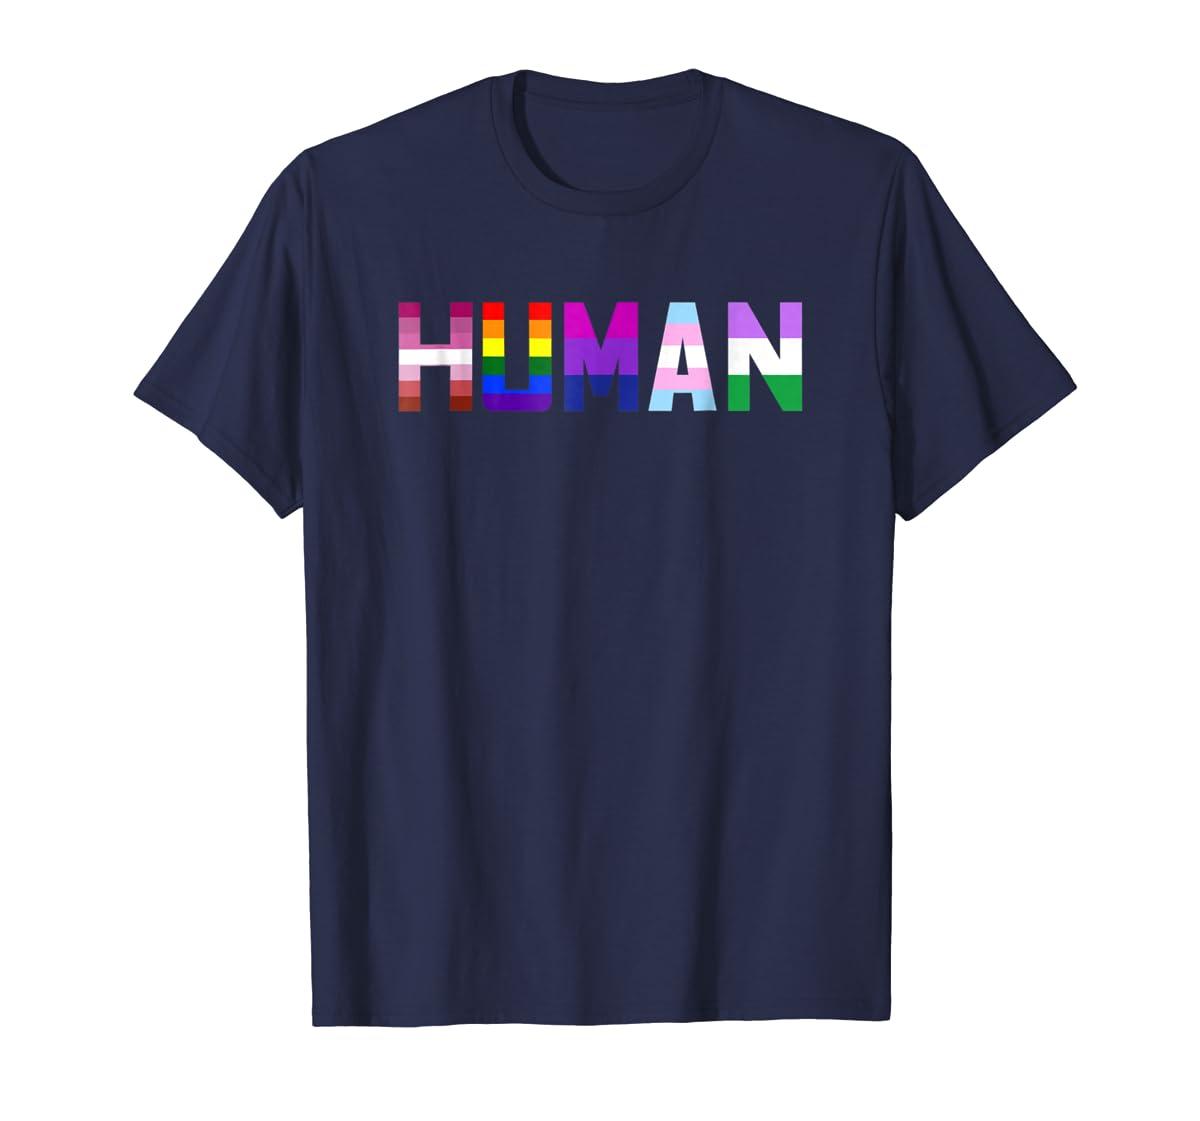 HUMAN Flag LGBT Gay Pride Month Transgender Ally T Shirt-Men's T-Shirt-Navy